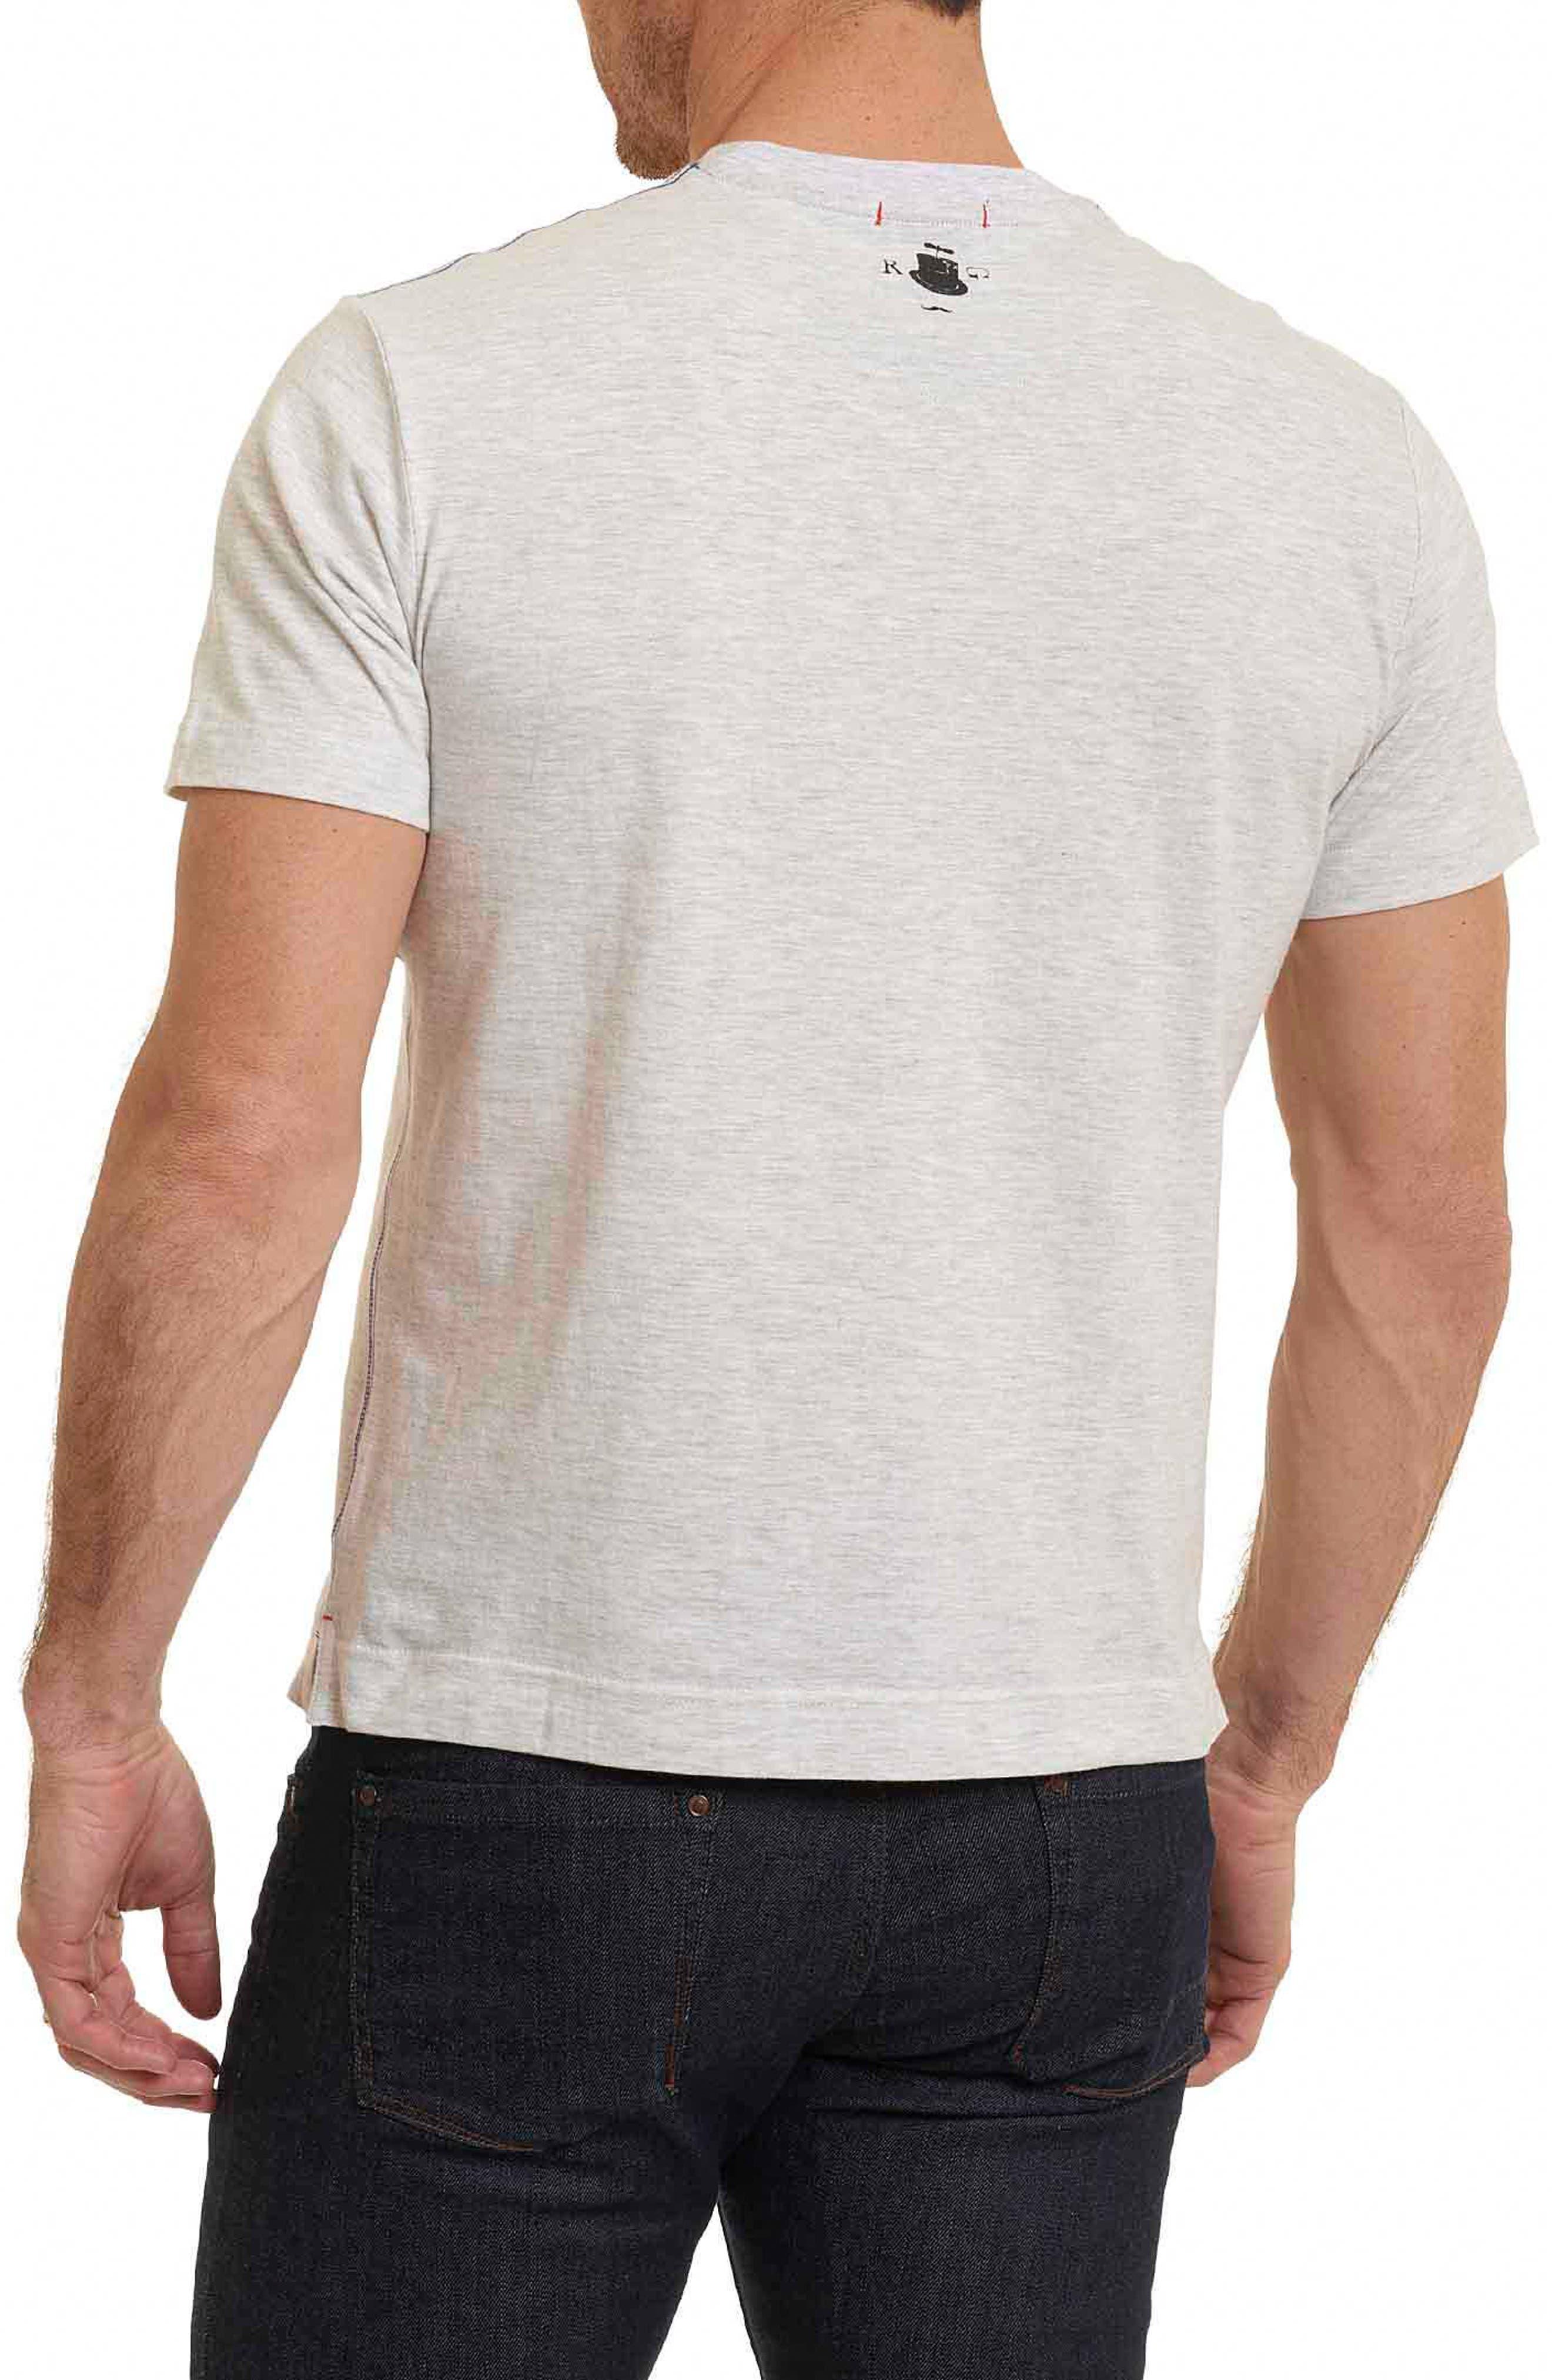 Alternate Image 2  - Robert Graham Guns Ready T-Shirt